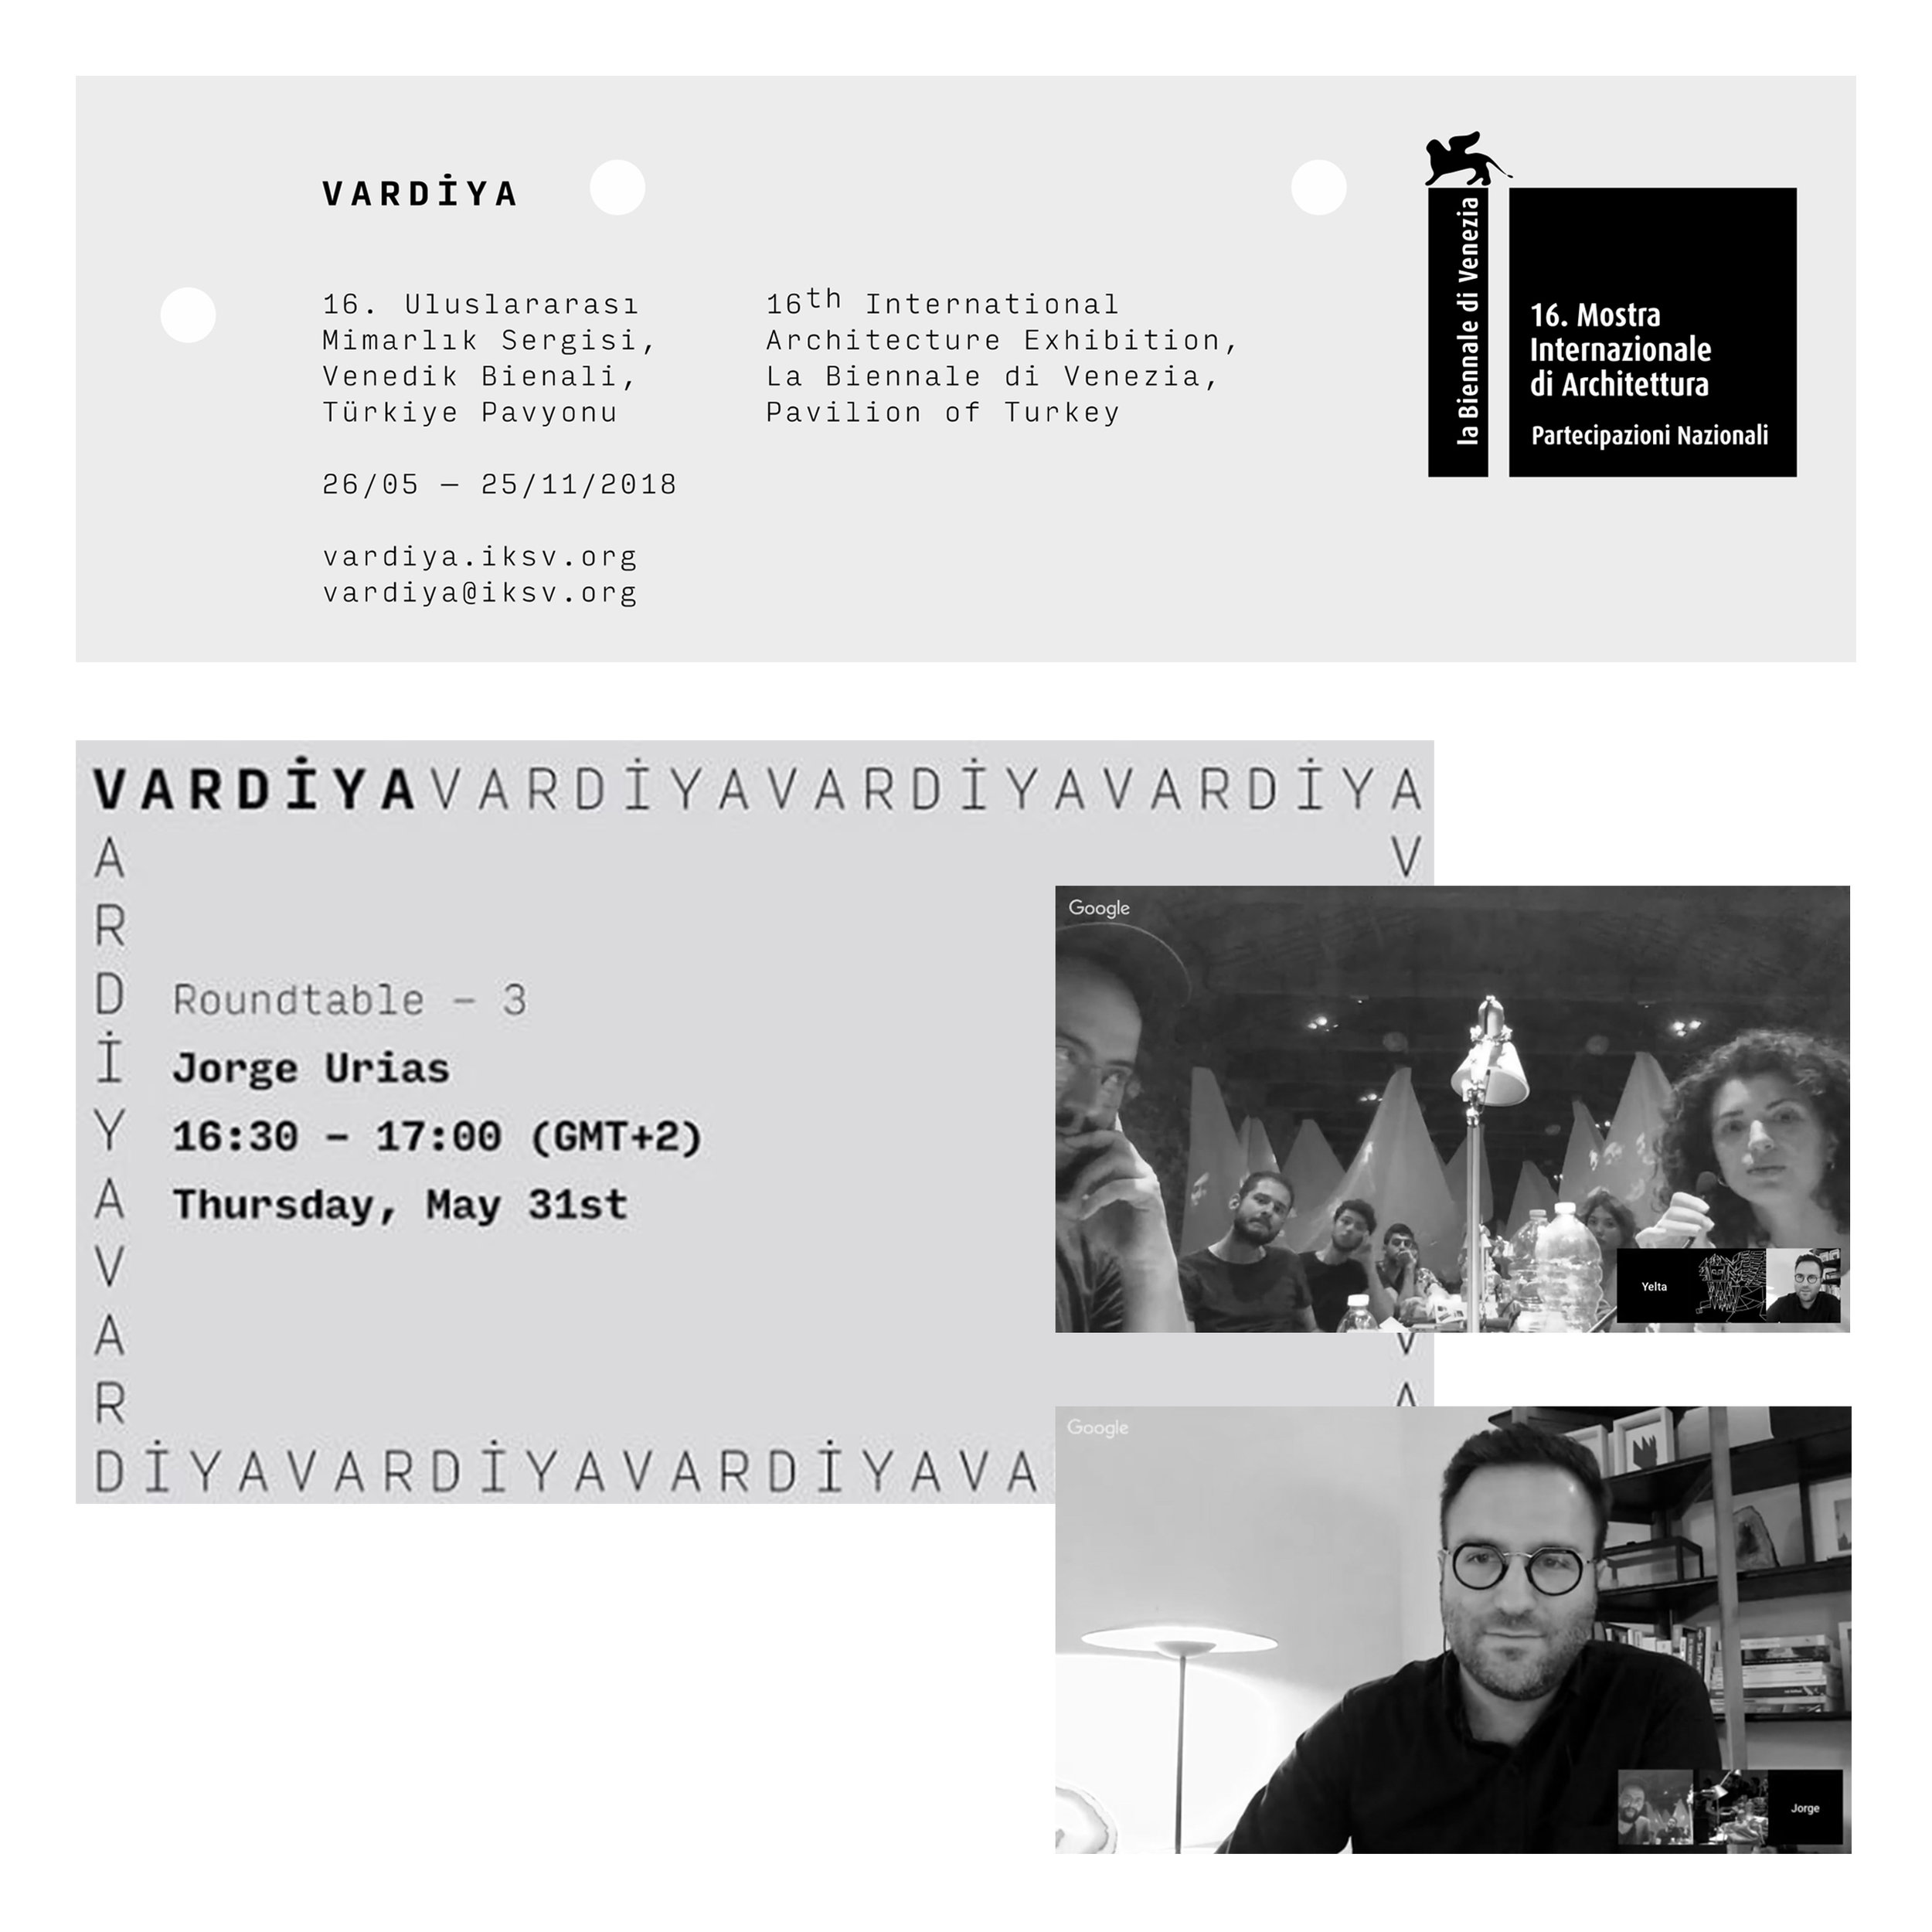 Vardiya Venice Biennale.jpg